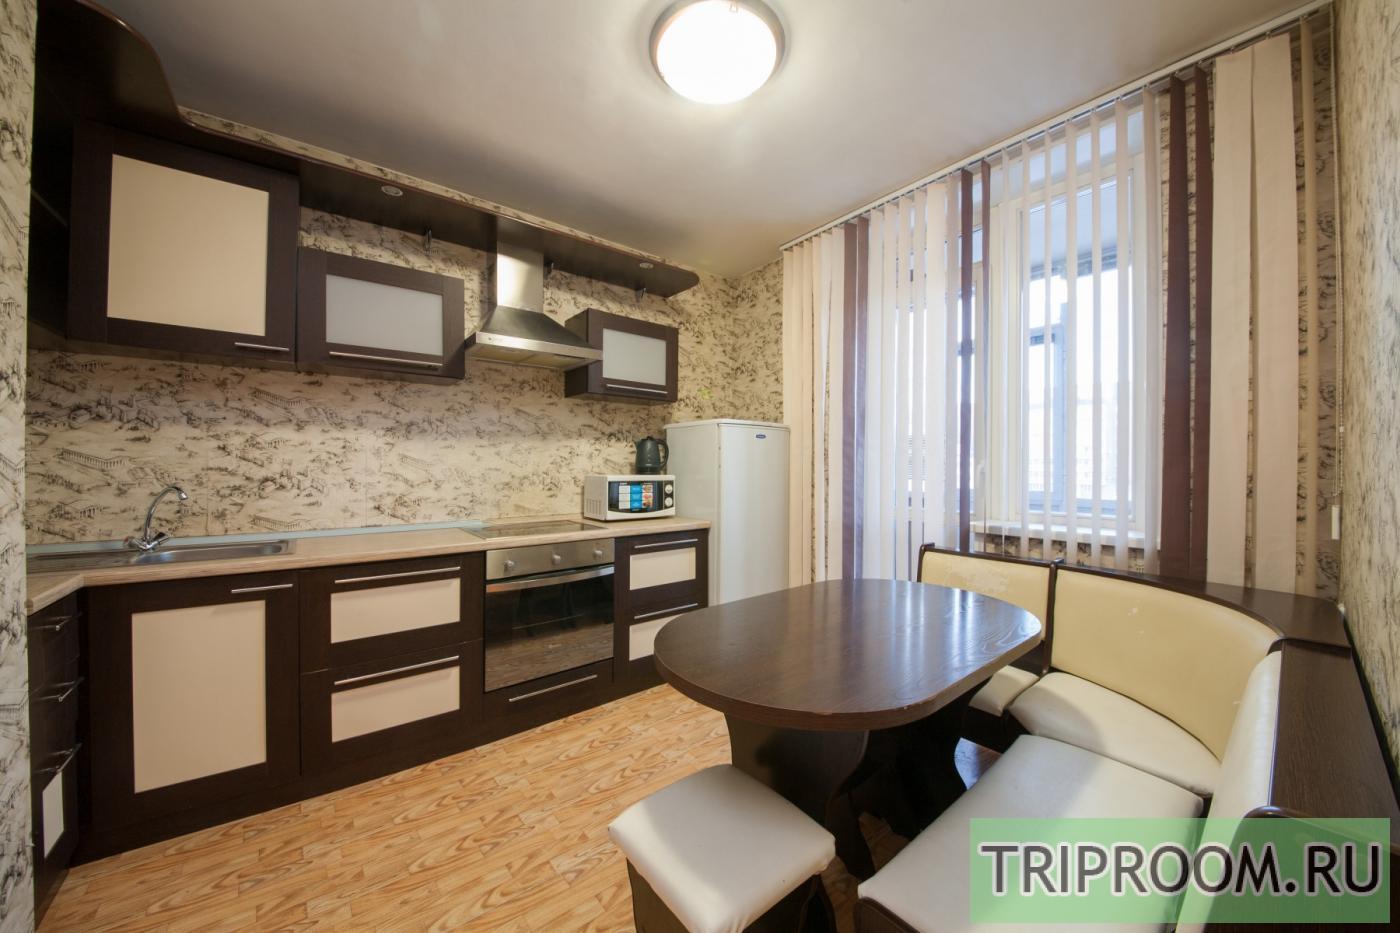 1-комнатная квартира посуточно (вариант № 35185), ул. Алексеева улица, фото № 7